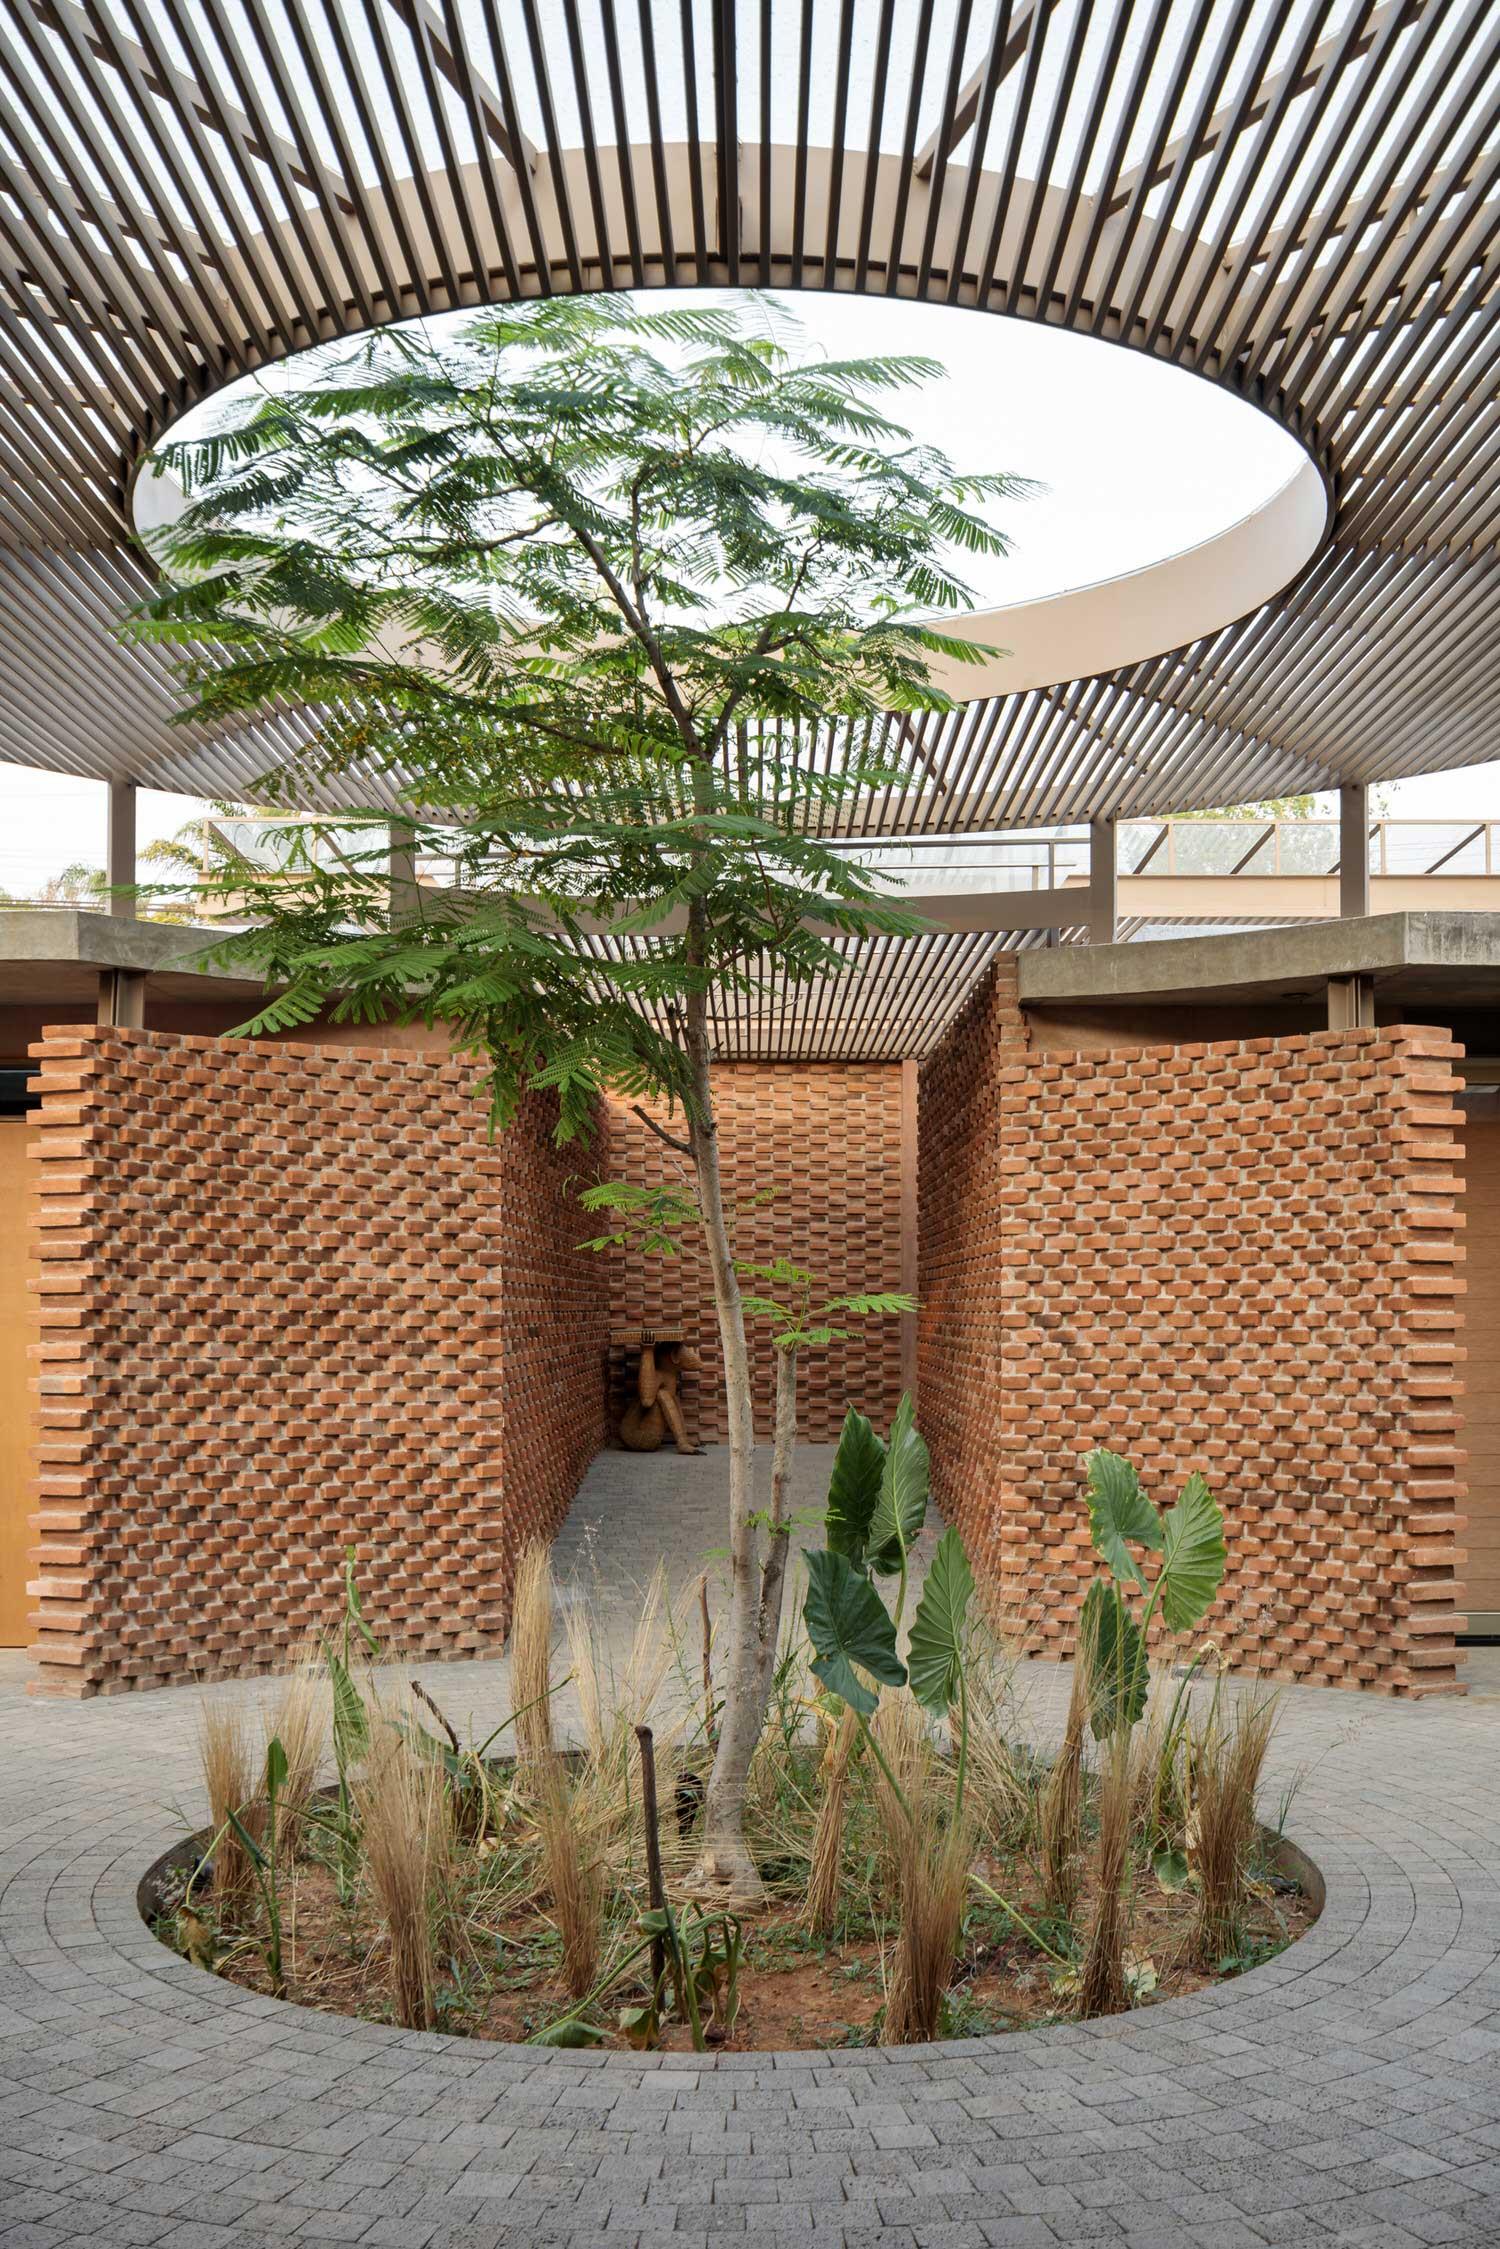 Daniela Bucio Sistos Uc House Morelia Mexico Brick Architecture Photo Dane Alonso Yellowtrace 06